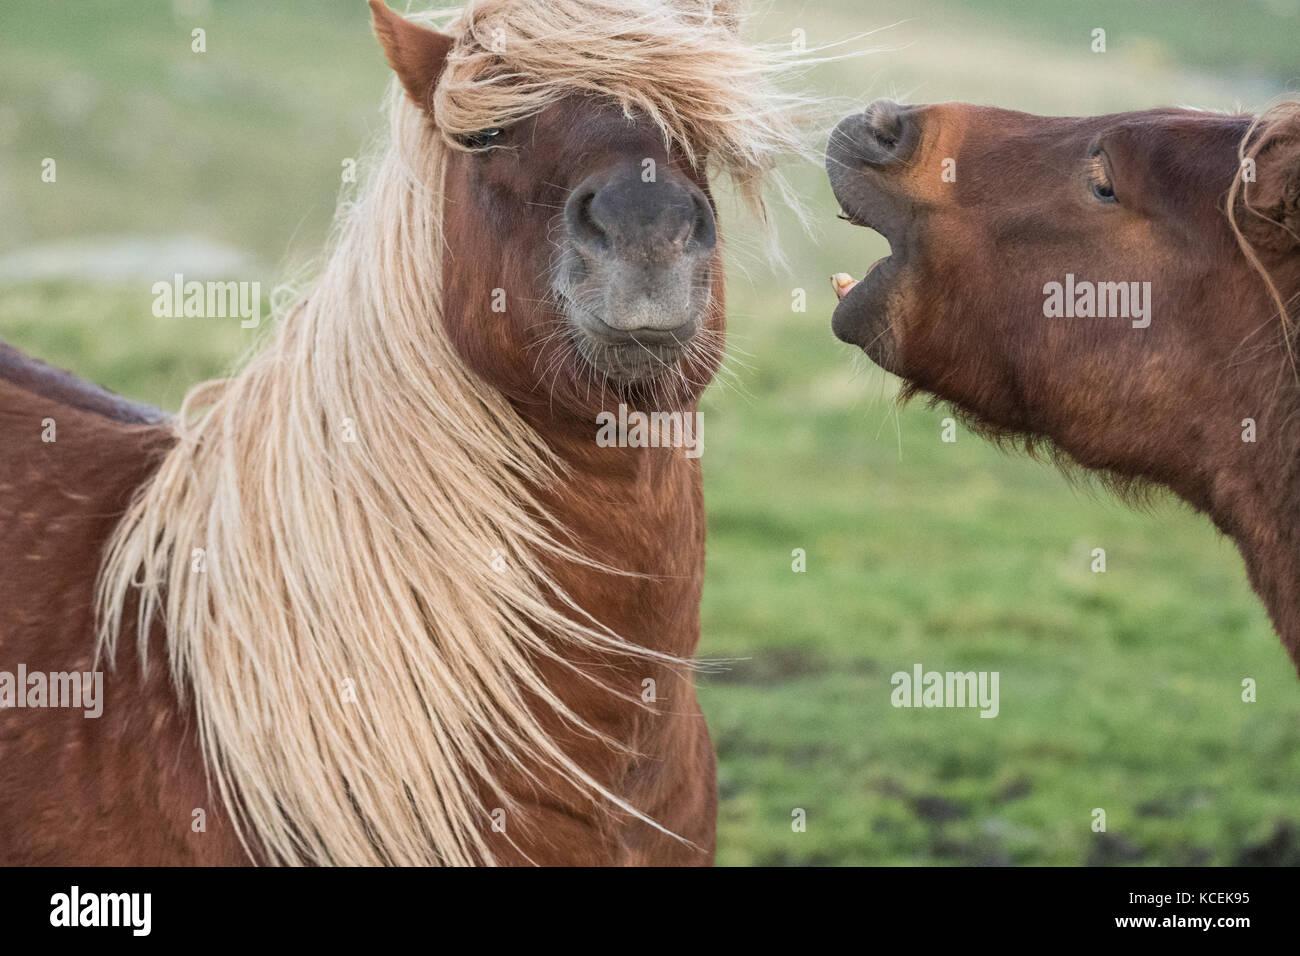 Funny horse - Shetland Ponies fighting in the Shetland Islands, Scotland, UK - Stock Image